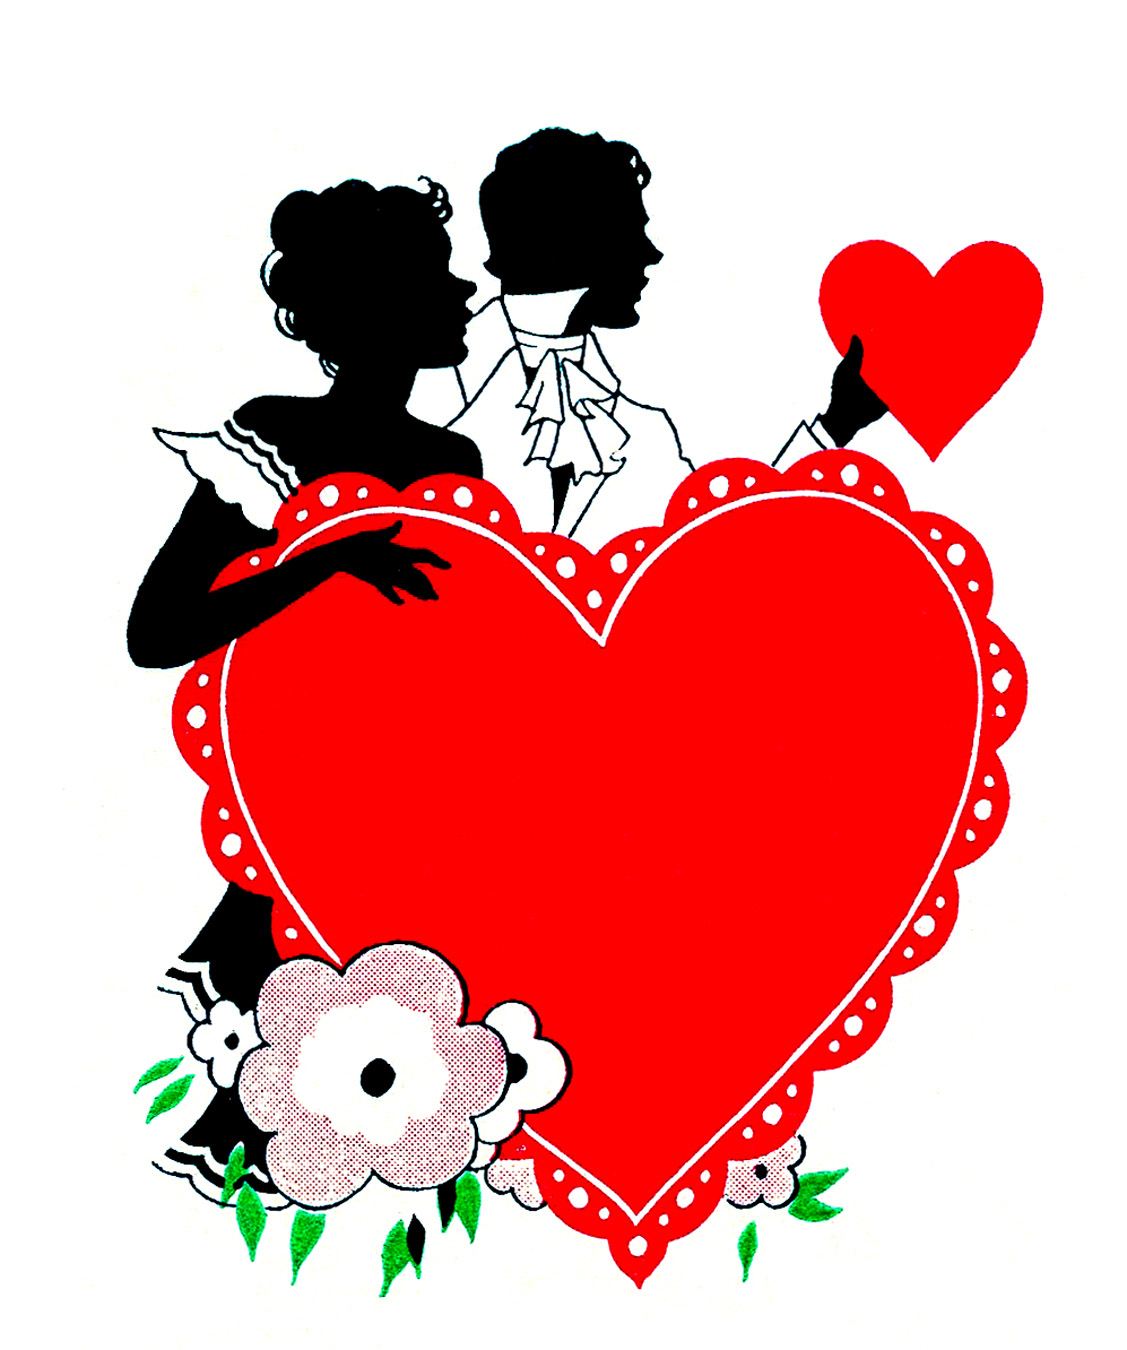 12 Vintage Valentine Silhouettes! - The Graphics Fairy - Free Printable Vintage Valentine Clip Art